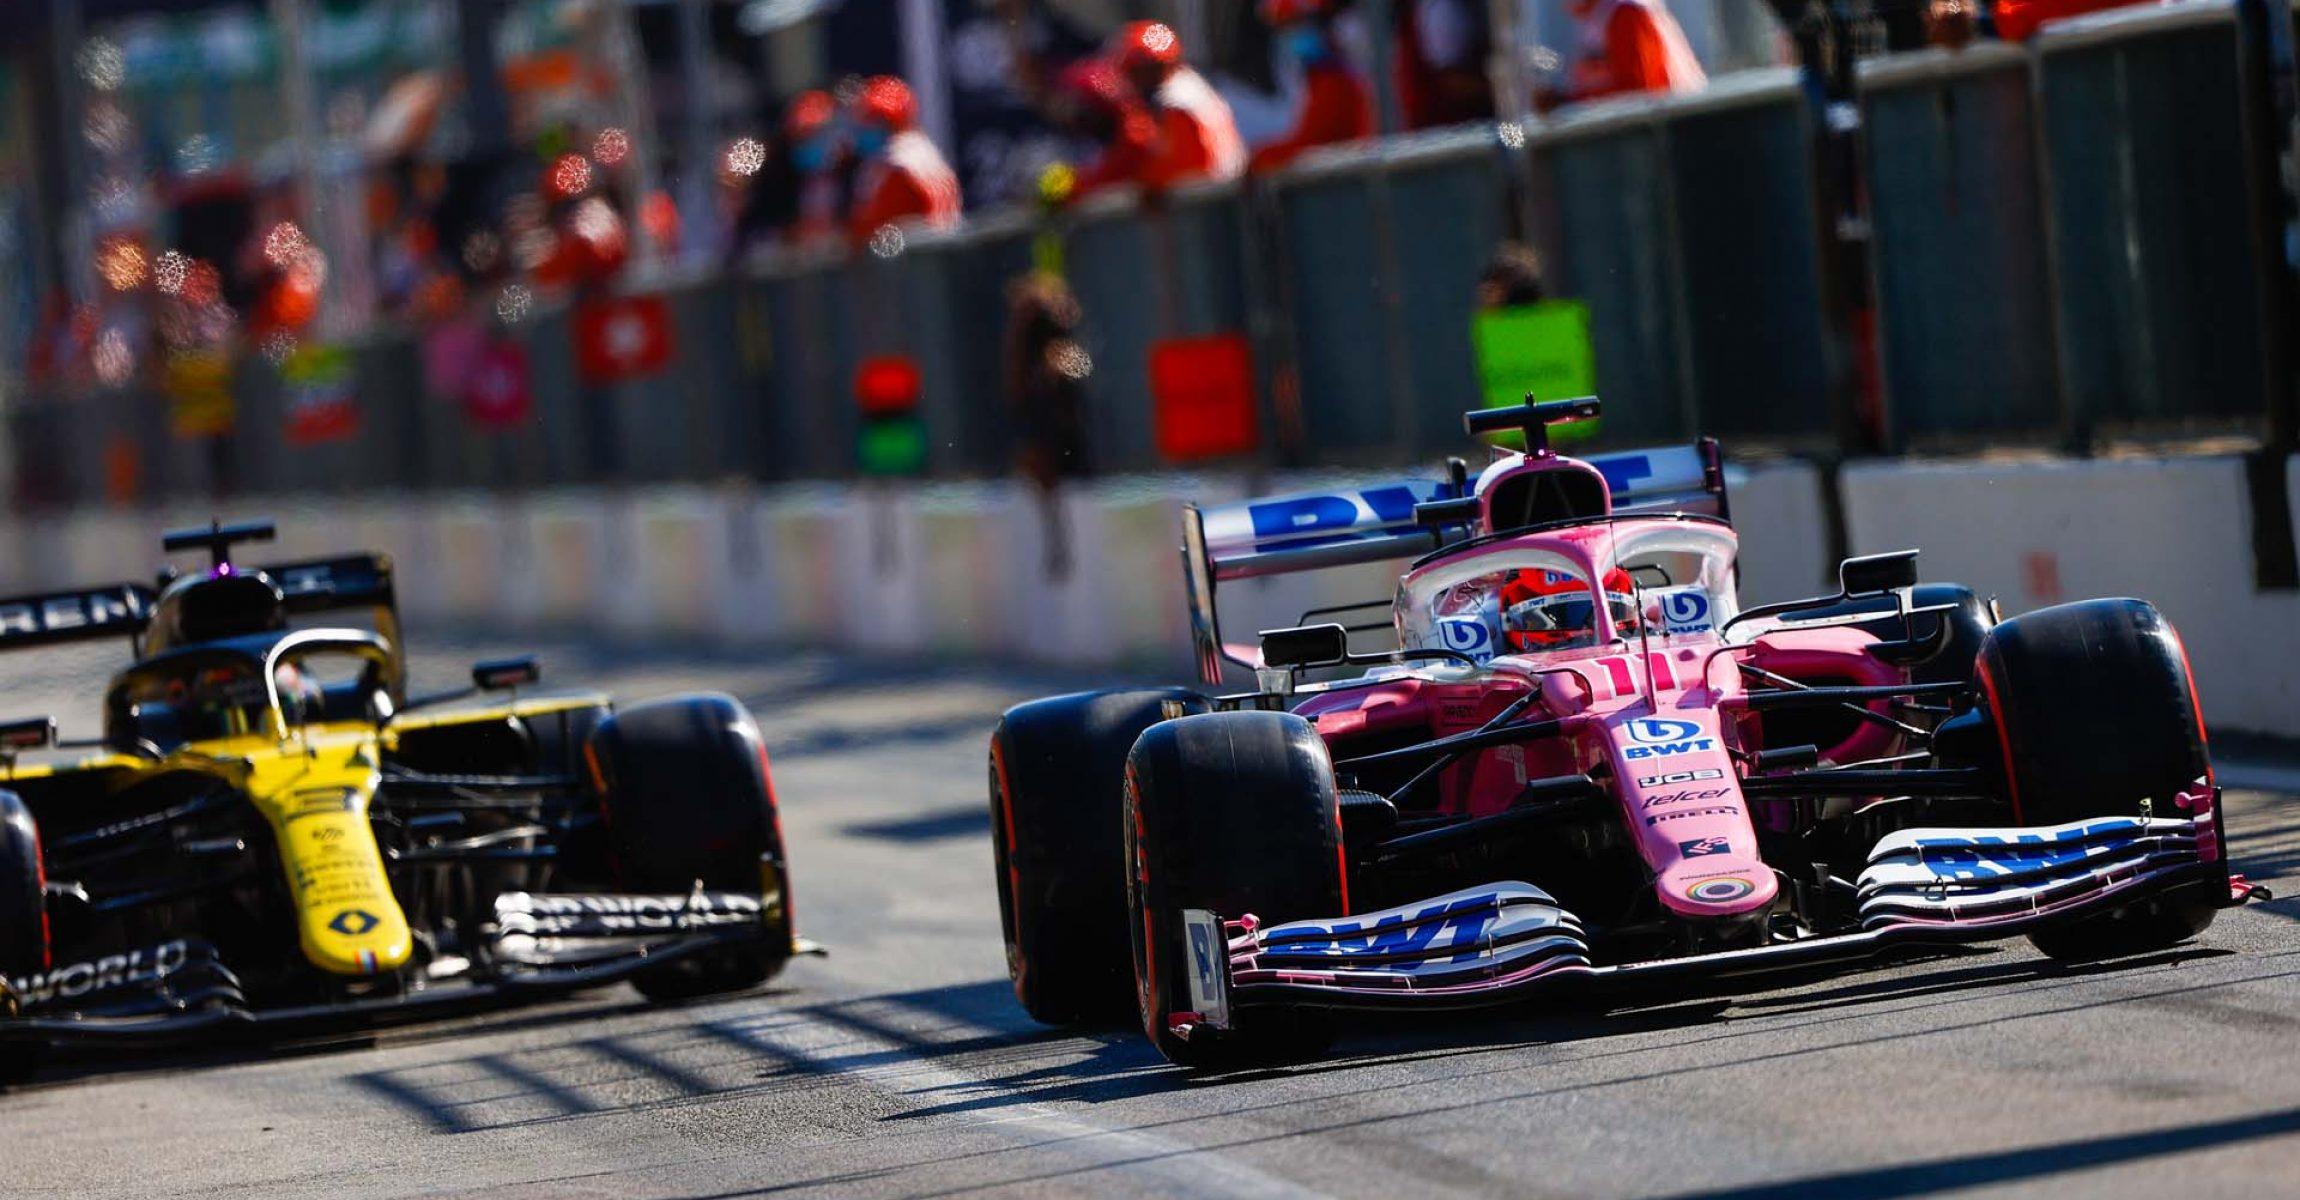 Sergio Perez, Racing Point RP20, leads Daniel Ricciardo, Renault R.S.20, in the pit lane